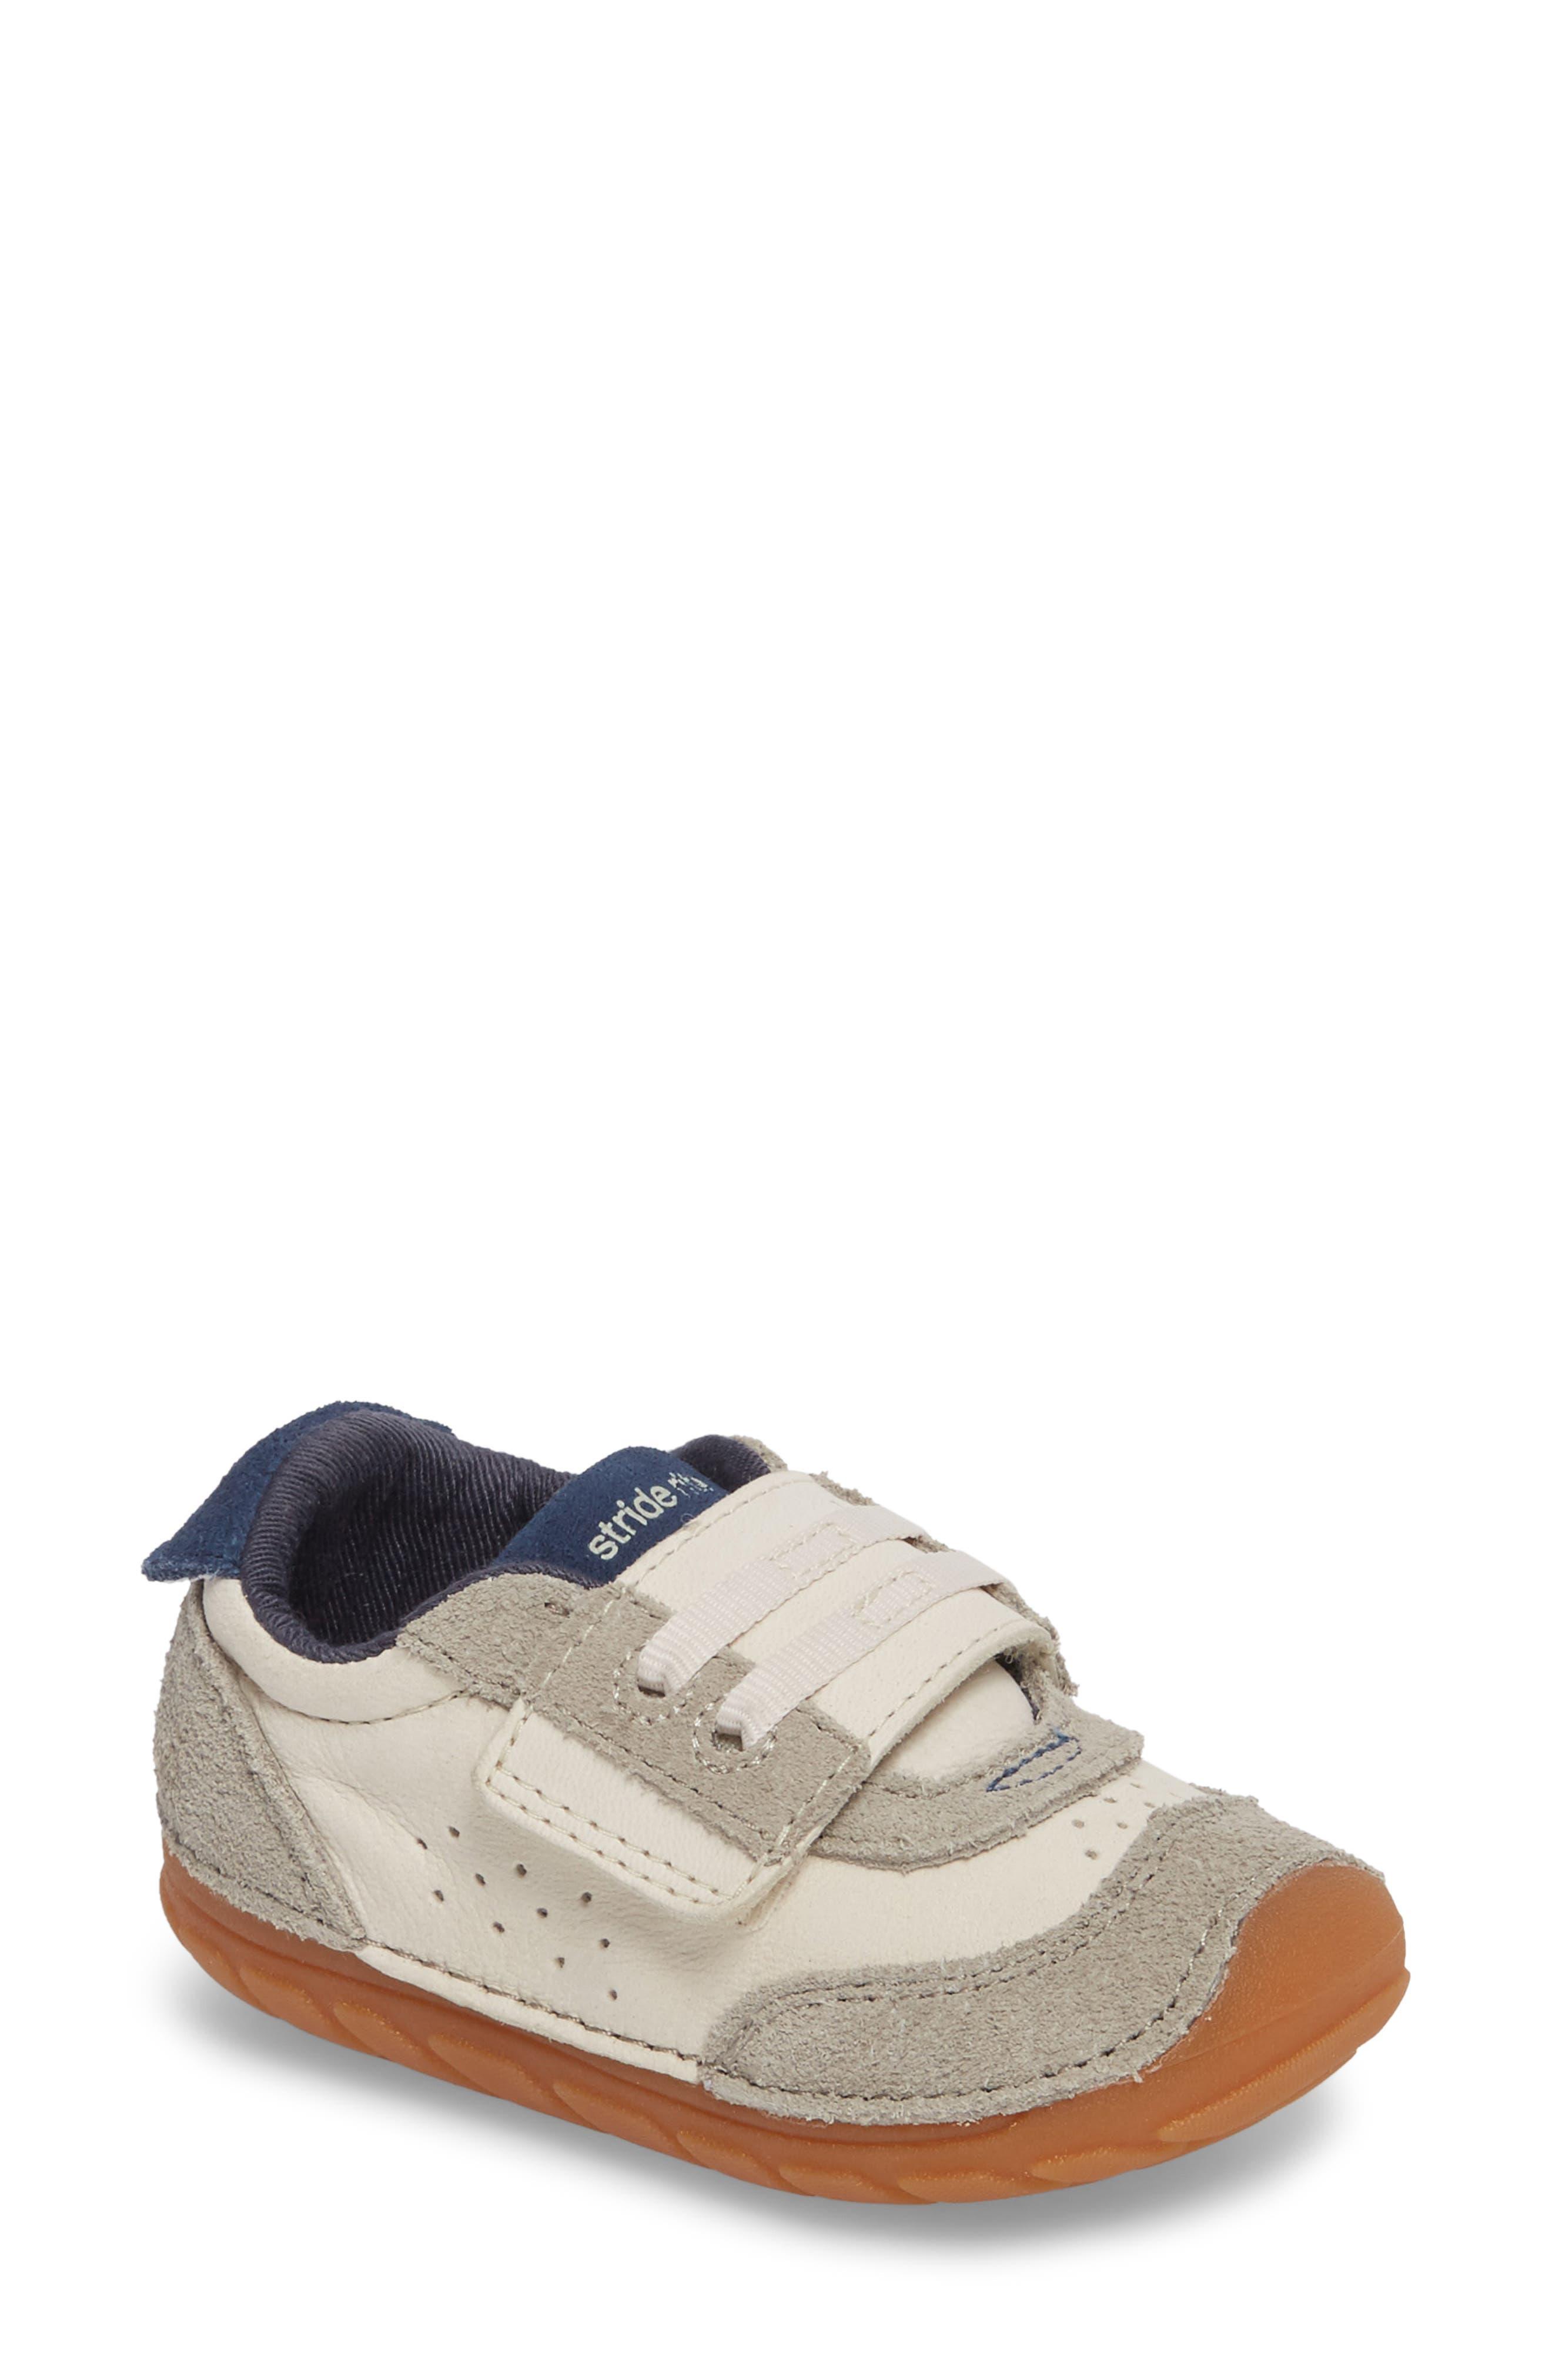 Soft Motion SRT Wyatt Sneaker,                         Main,                         color, Stone Leather